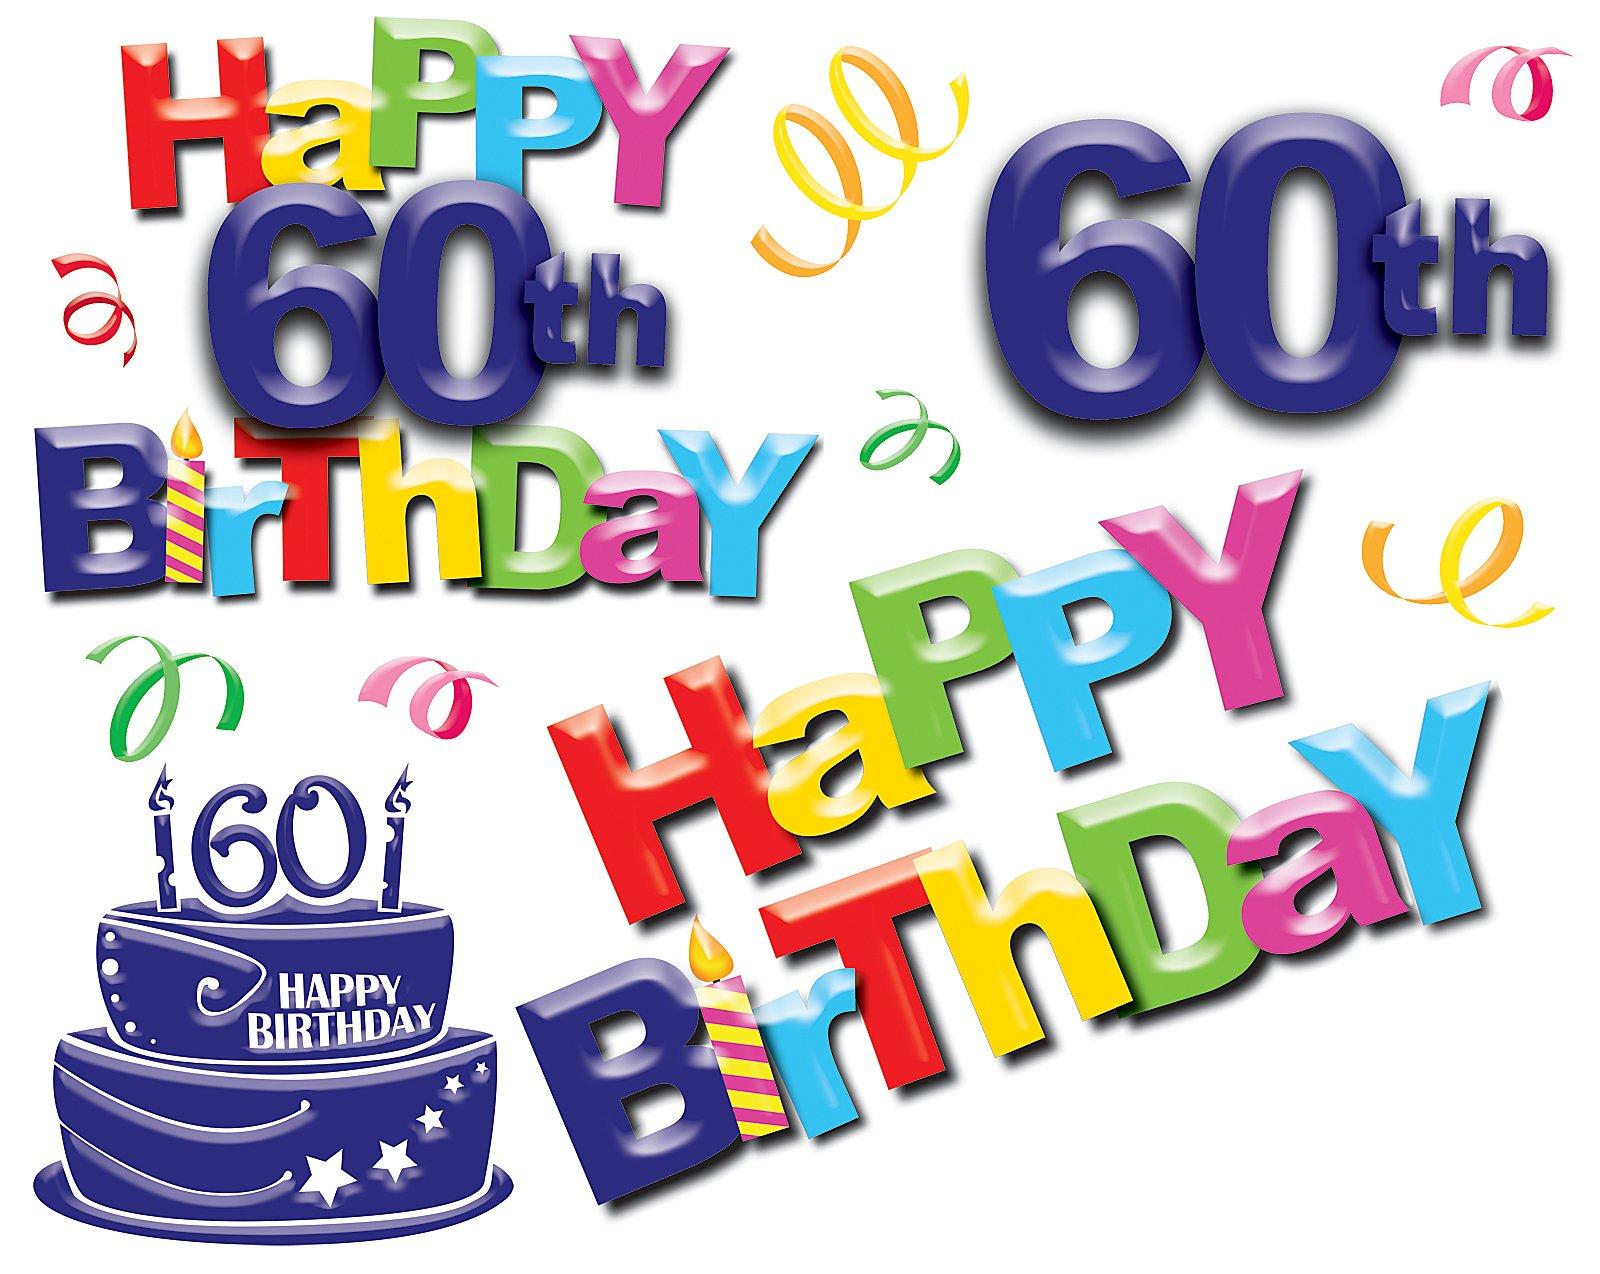 60 Birthday Clipart Free Download Best 60 Birthday Clipart